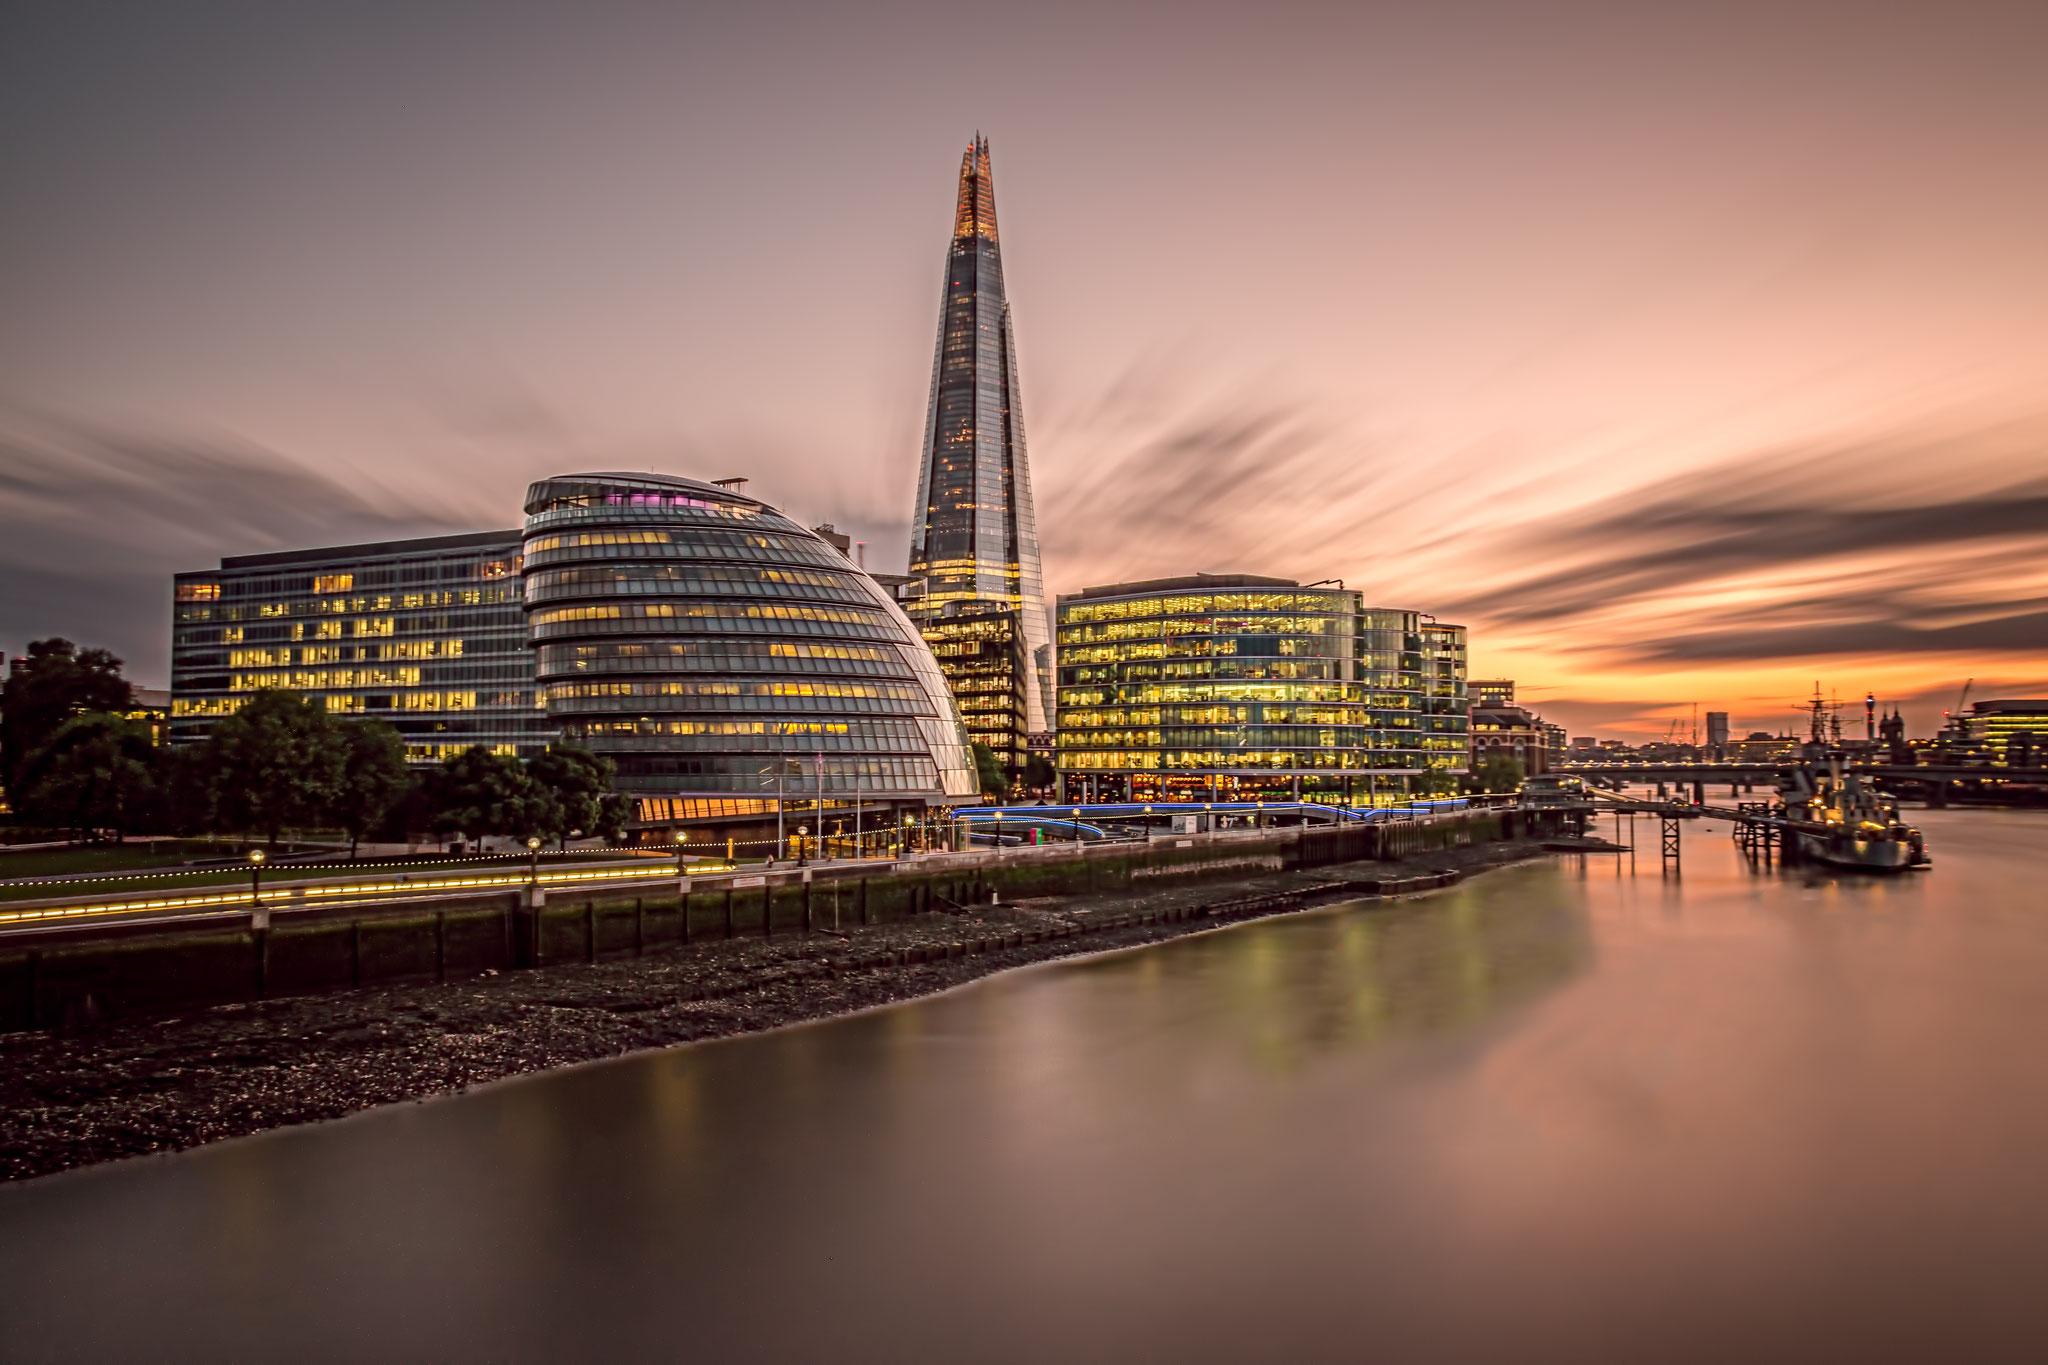 112-Ahmed LASHIN (Alexandria-Egypt) - London (GB)